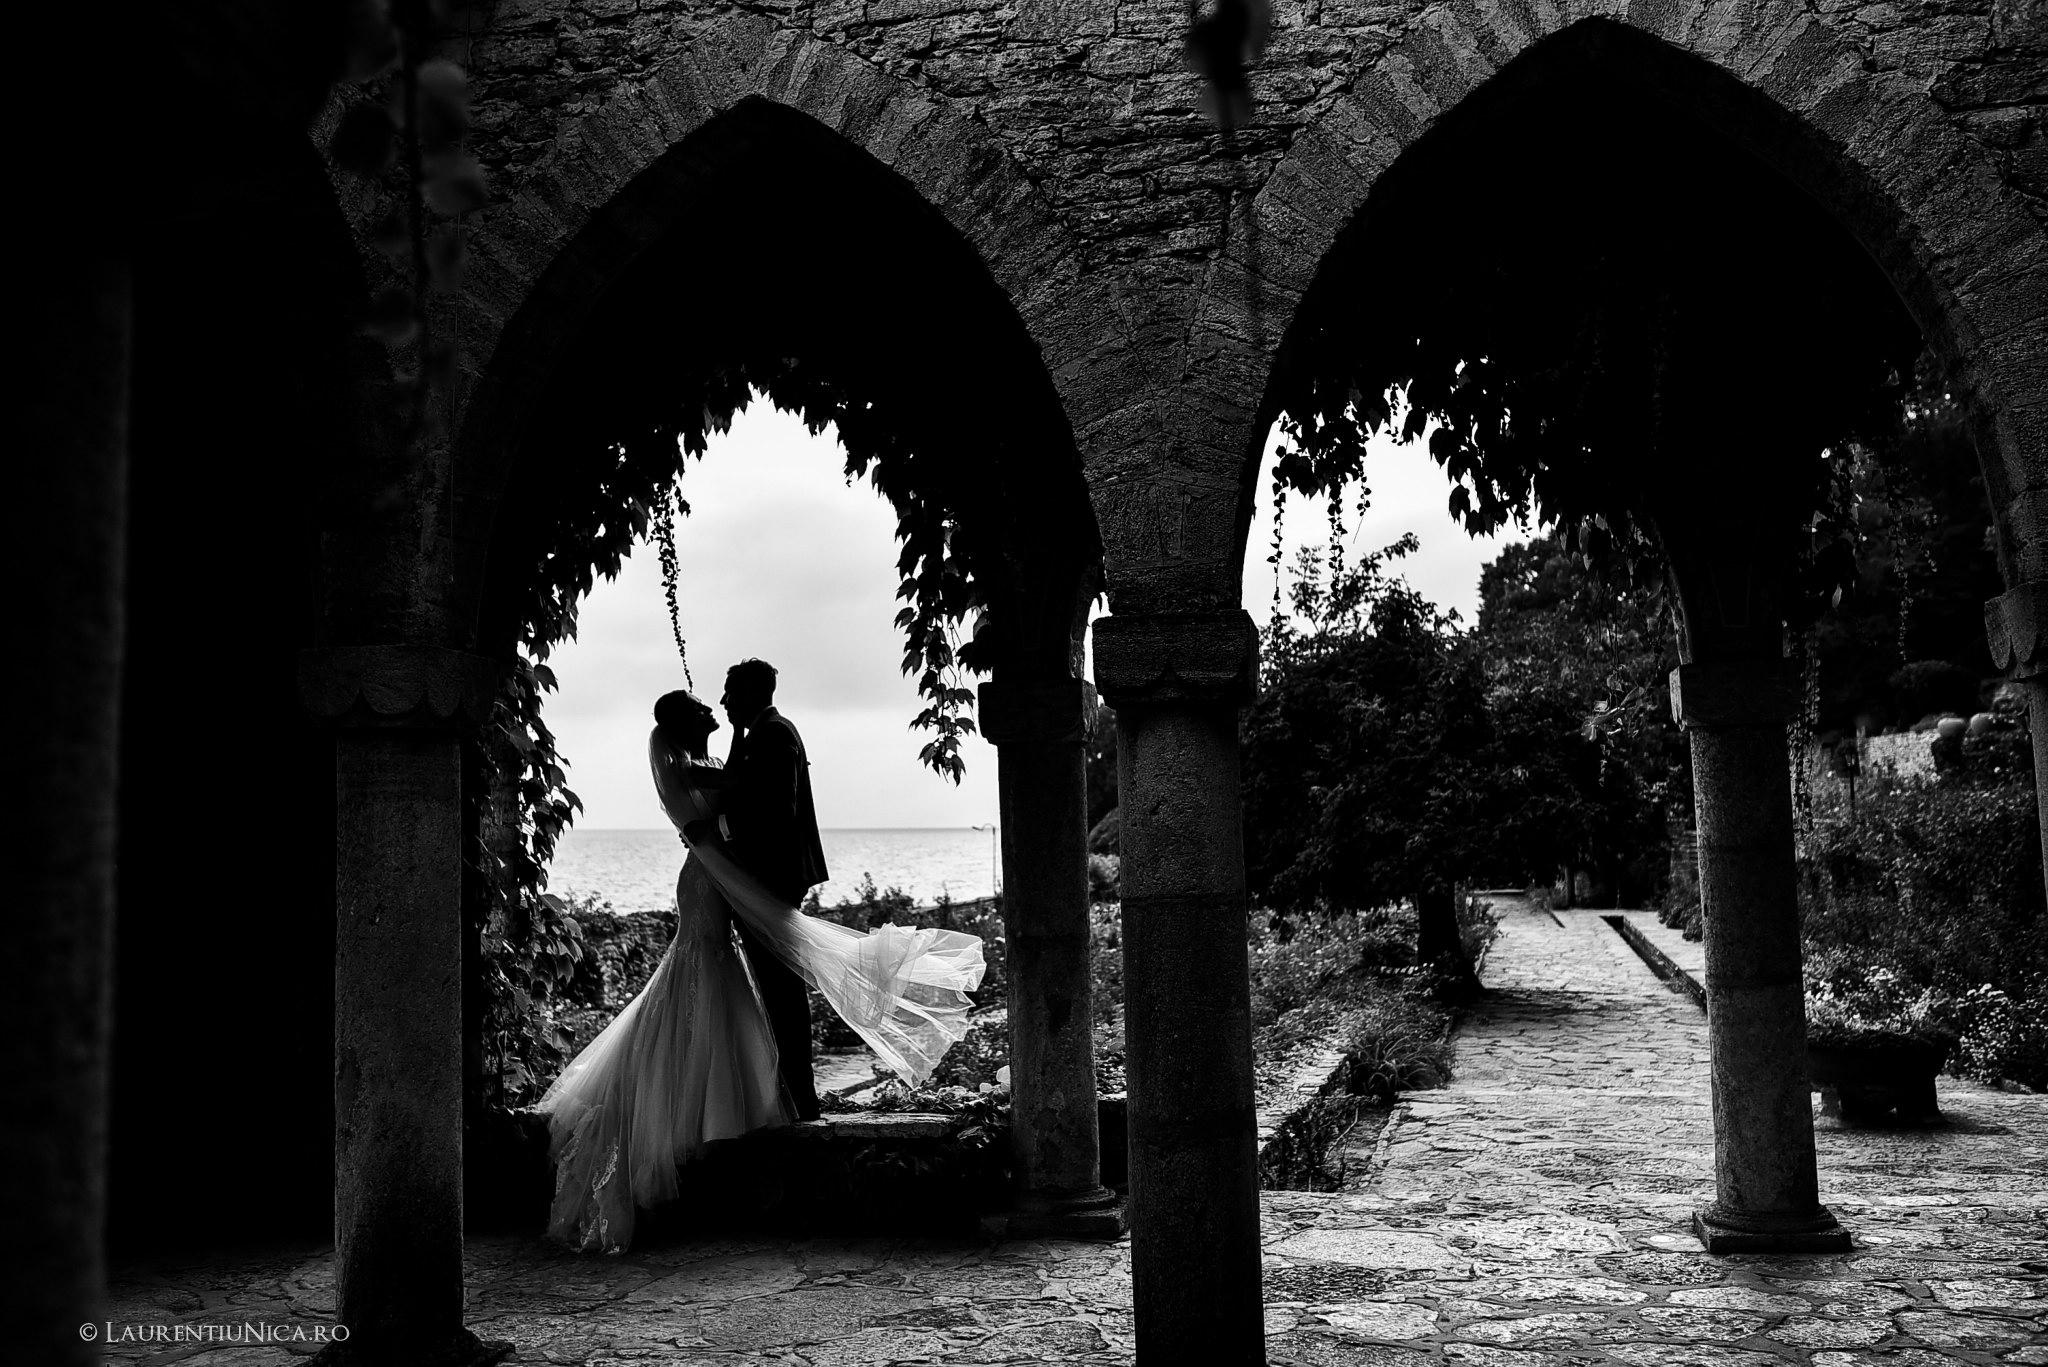 andreea si alin fotografii after wedding balchik bulgaria27 - Andreea & Alin | Fotografii After Wedding | Balchik Bulgaria